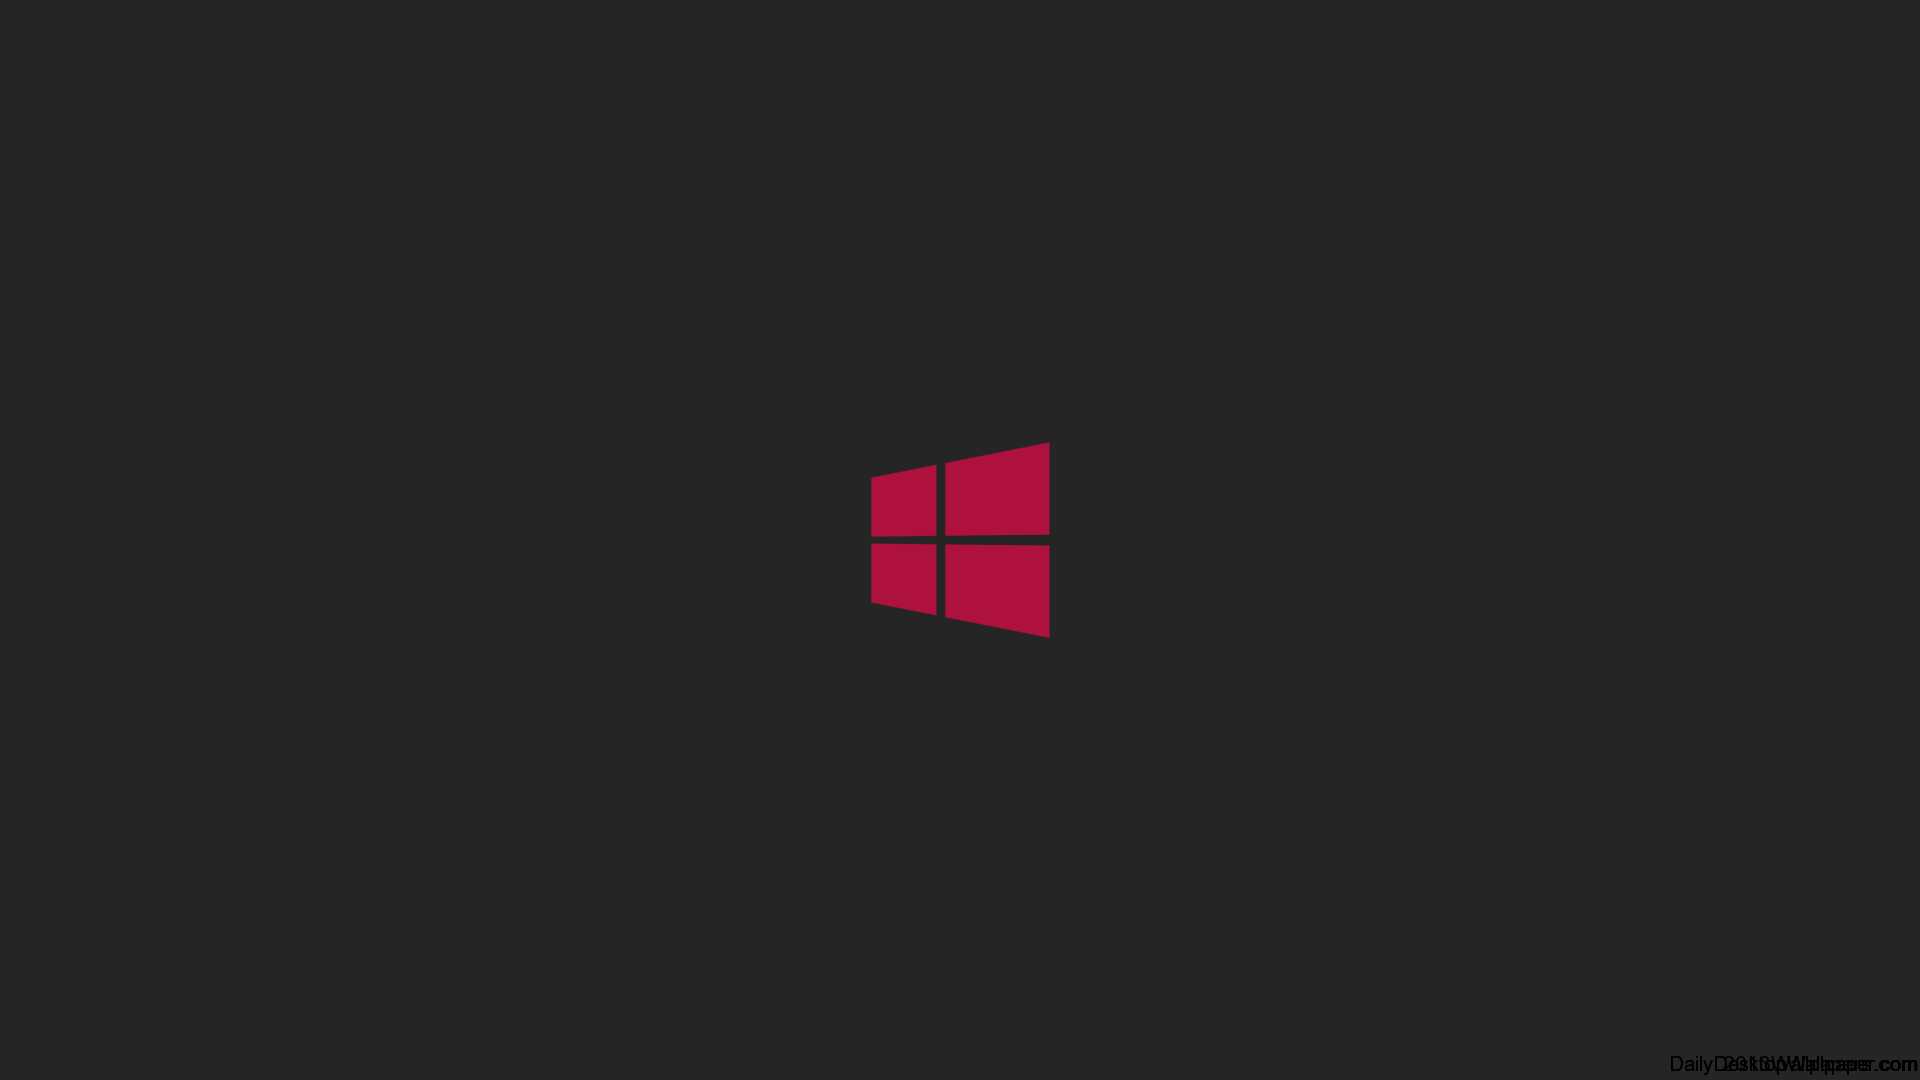 Hd wallpaper unique - Windows 10 Phone Wallpaper Hd Wallpapersafari